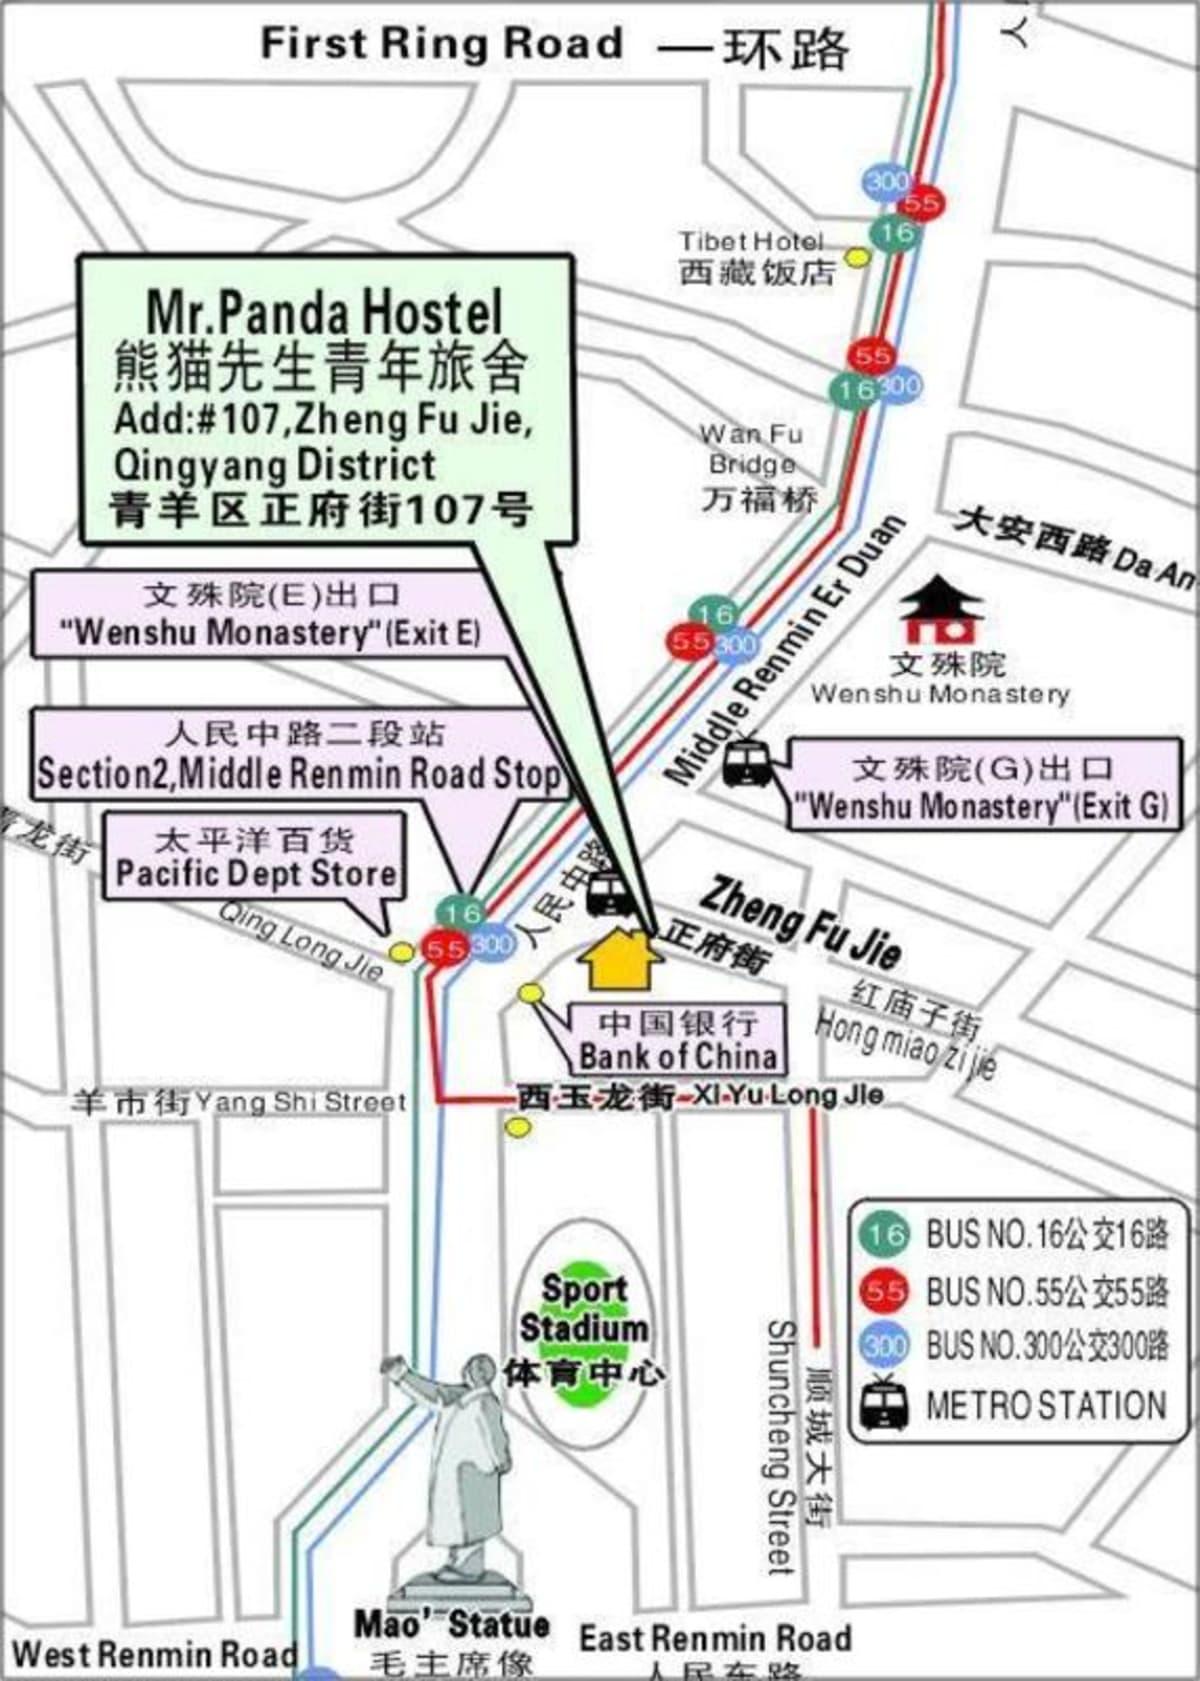 Mr. Panda Hostel, Chengdu, China